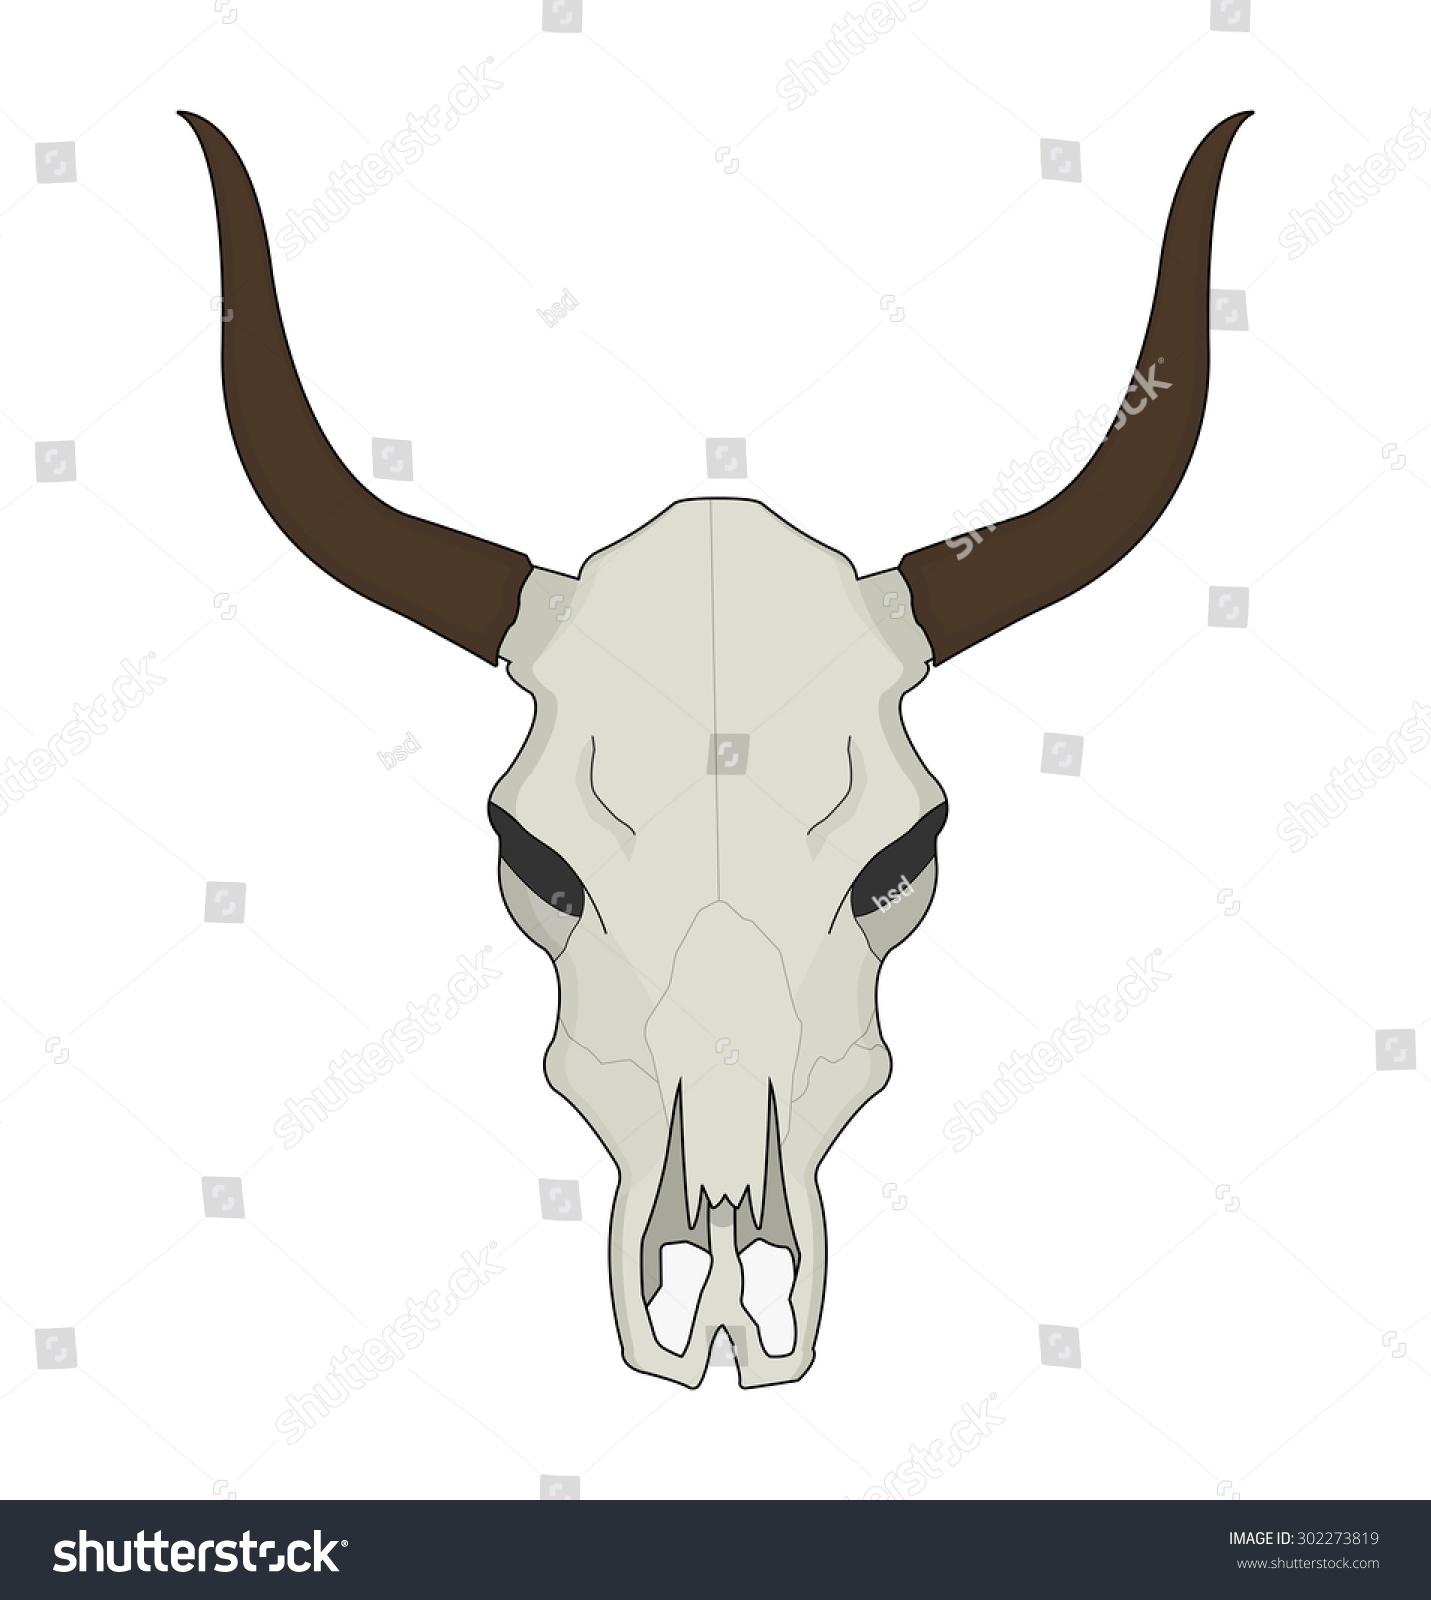 Cow Skull Wild West Dead Longhorn Vector de stock302273819: Shutterstock